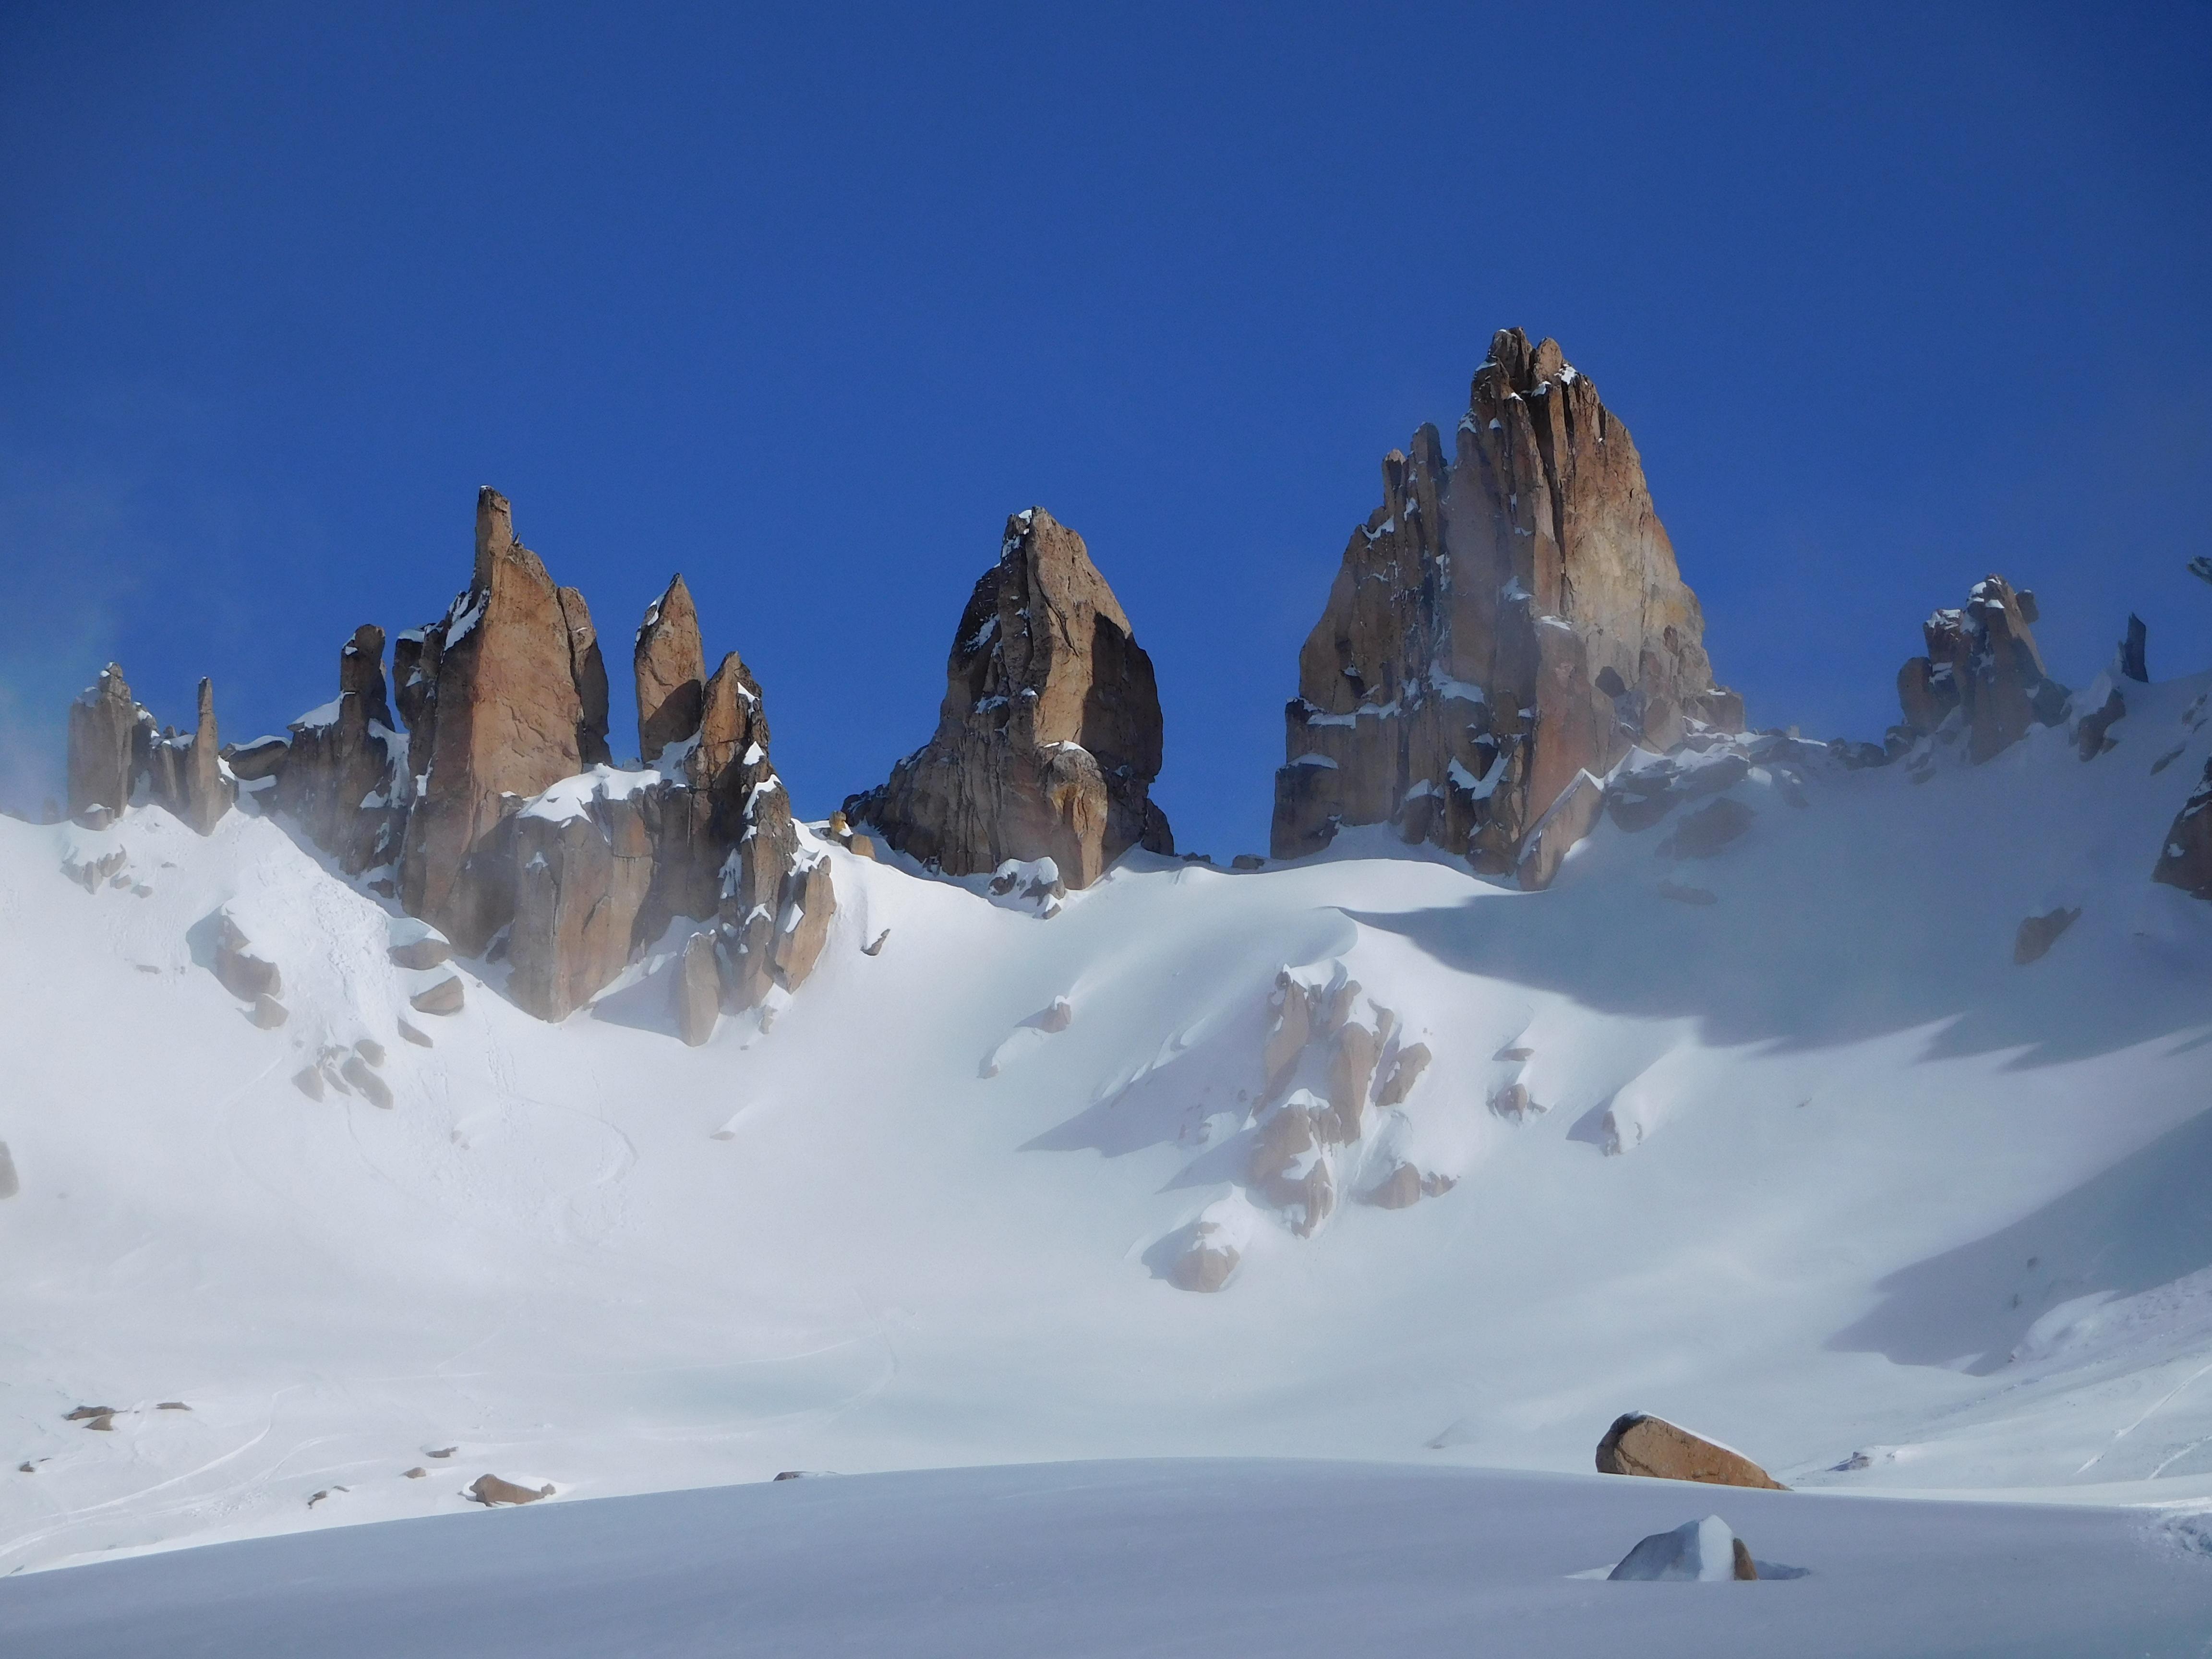 La Laguna at Cerro Catedral in Bariloche, Argentina in August 2016. photo: snowbrains